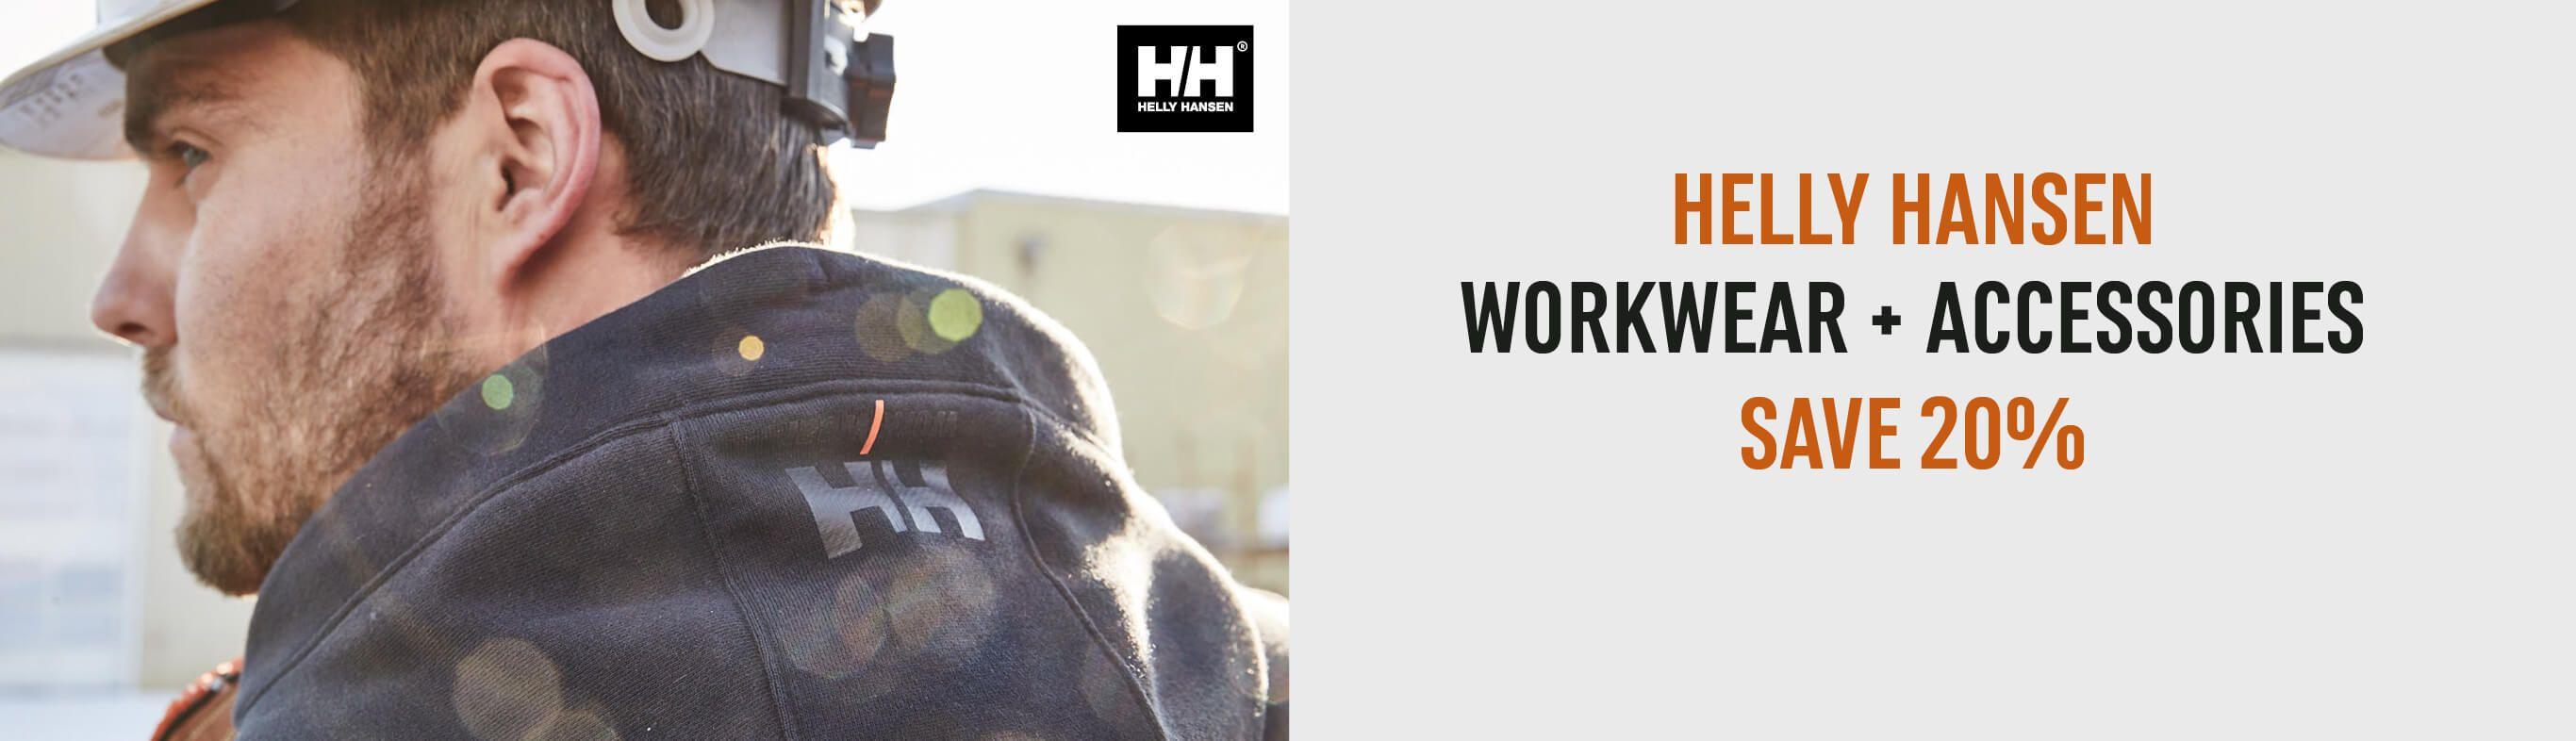 Helly Hansen Workwear and Accessories - Save 20%